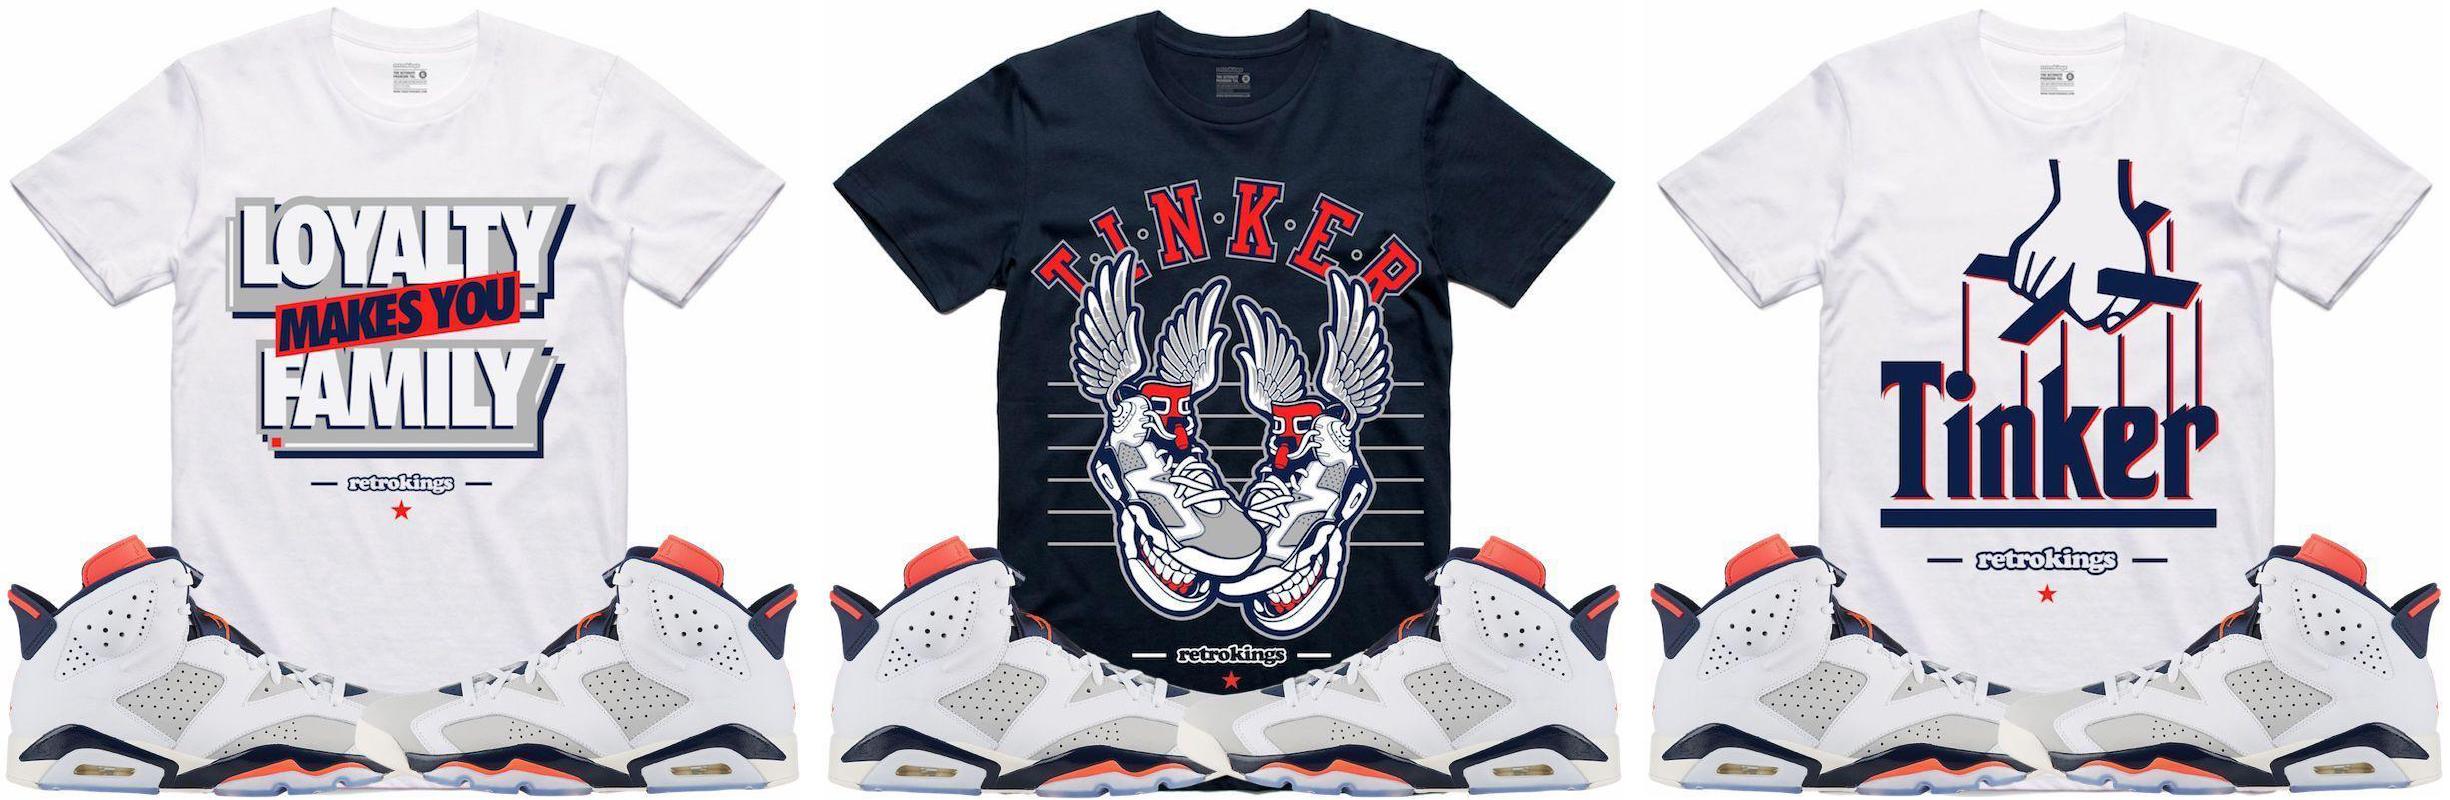 jordan-6-tinker-sneaker-shirts